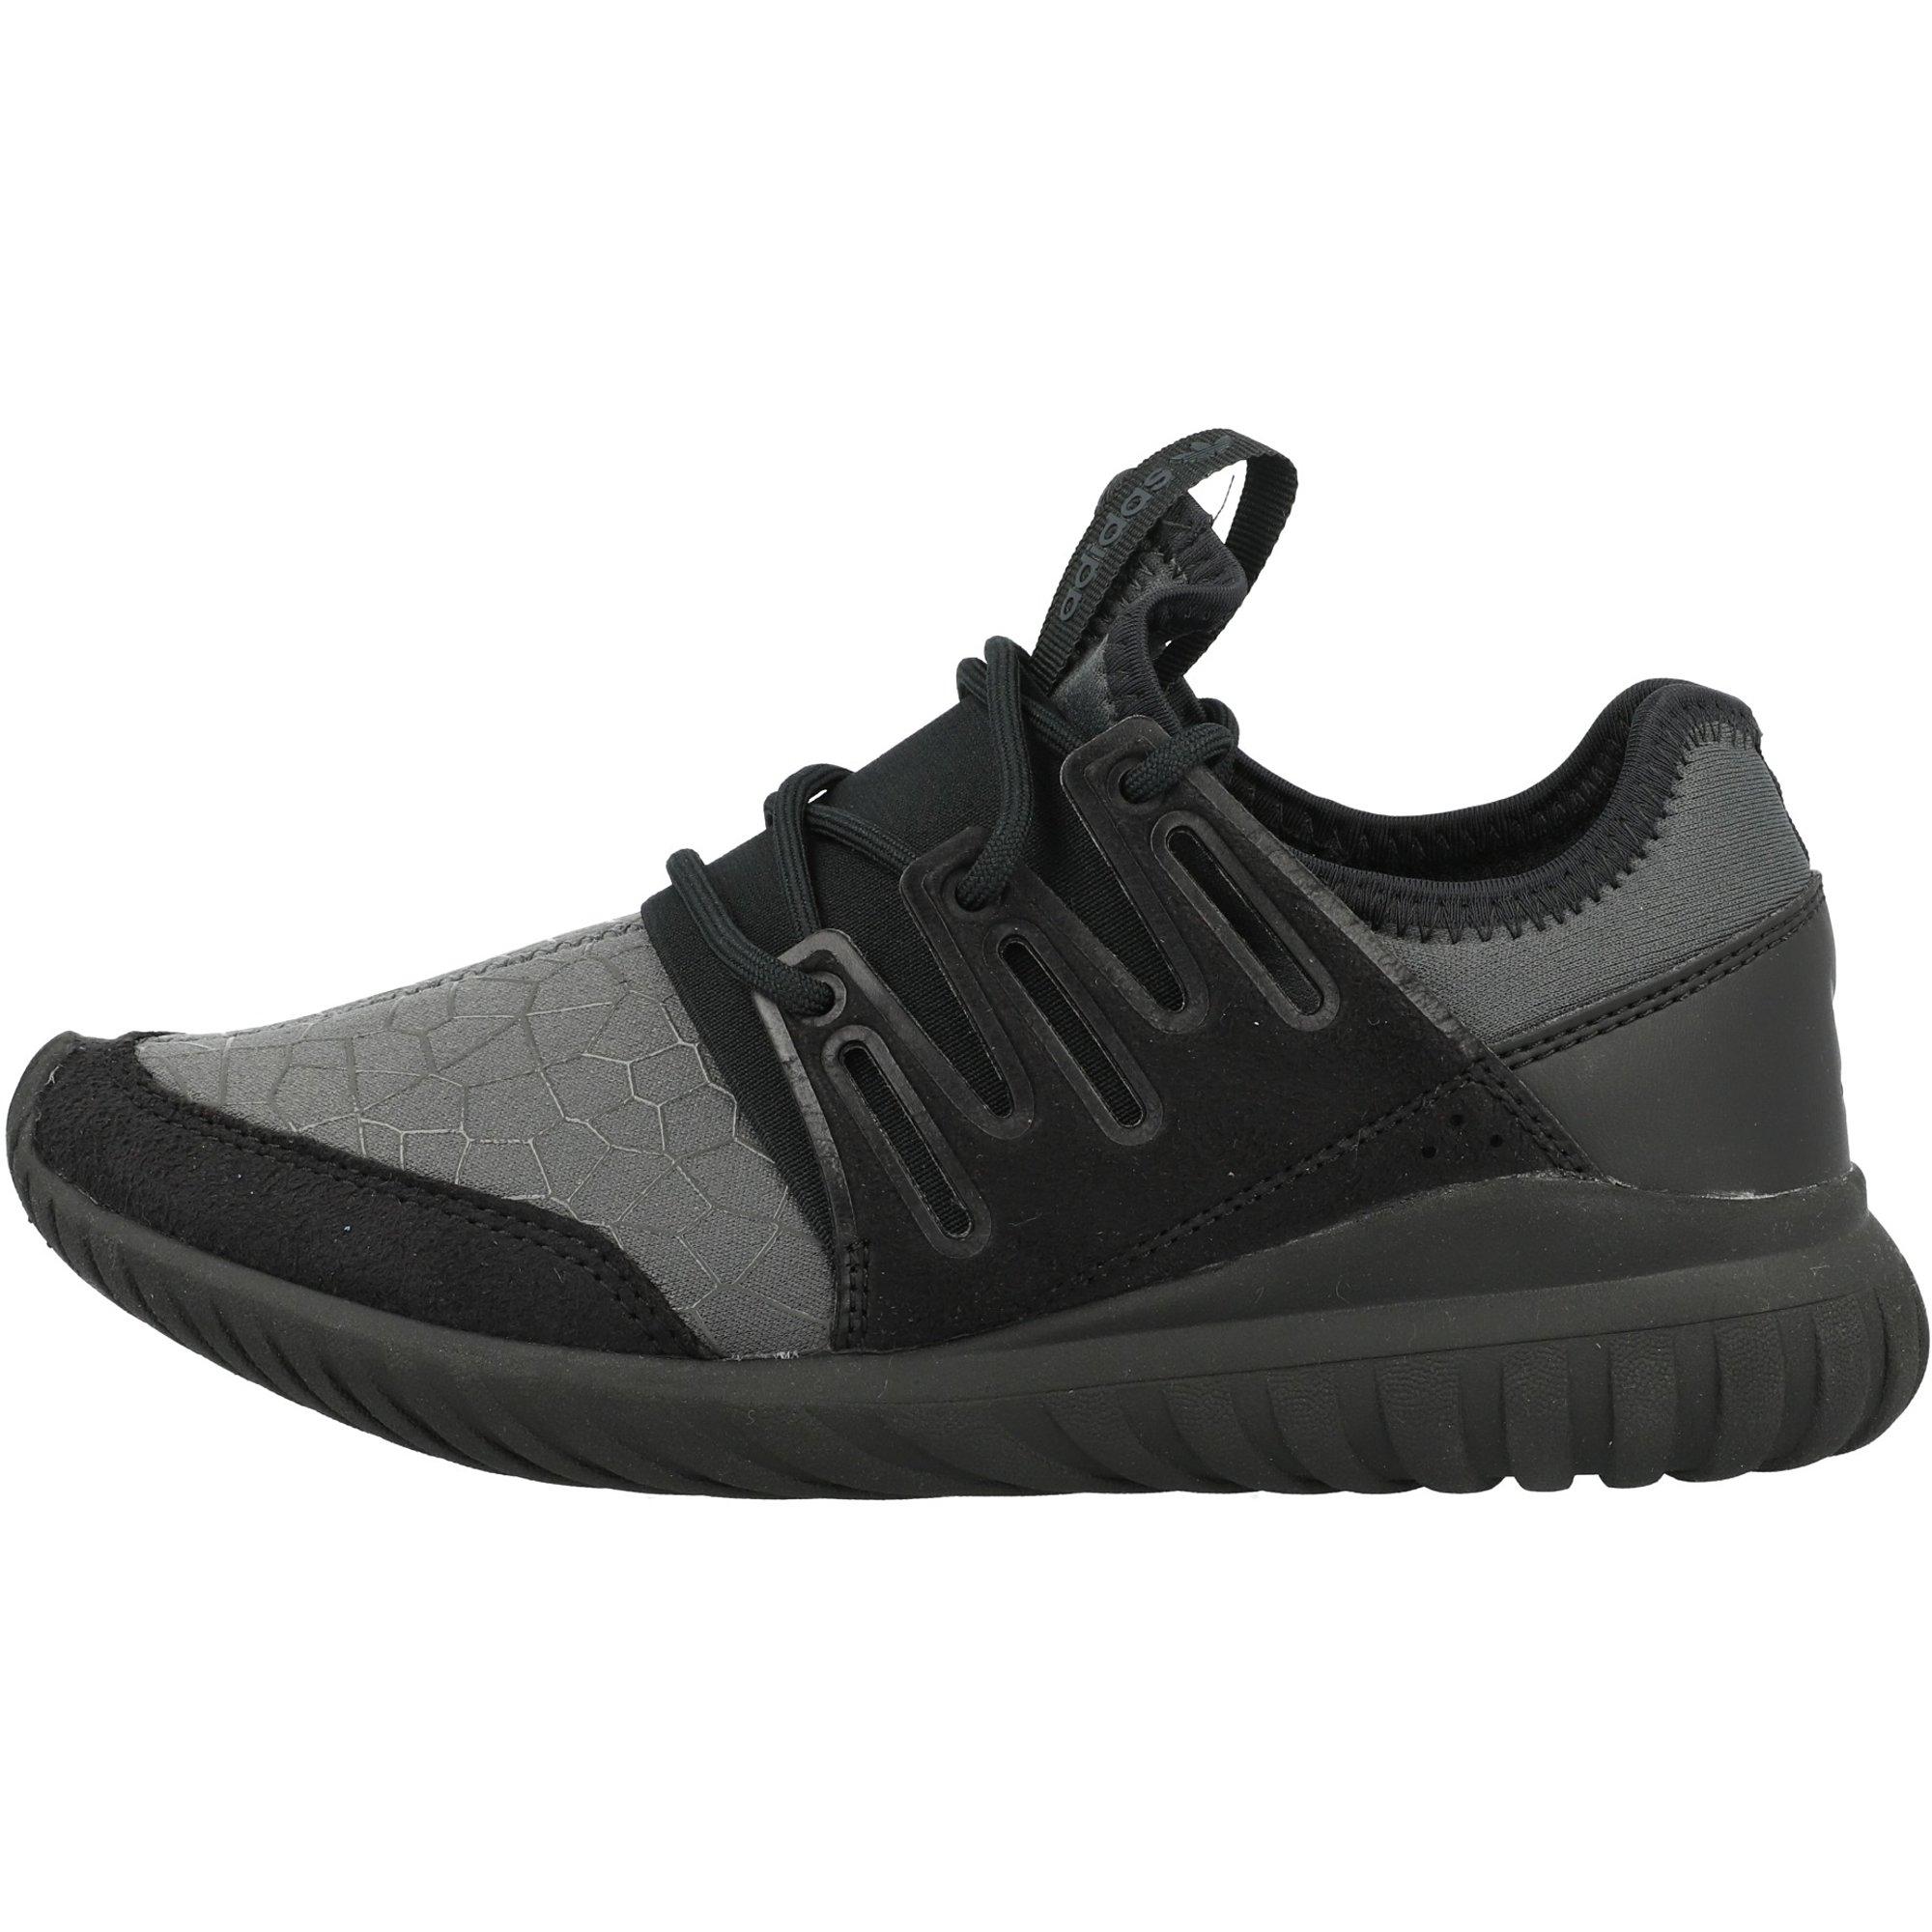 adidas Originals Tubular Radial J Black Textile